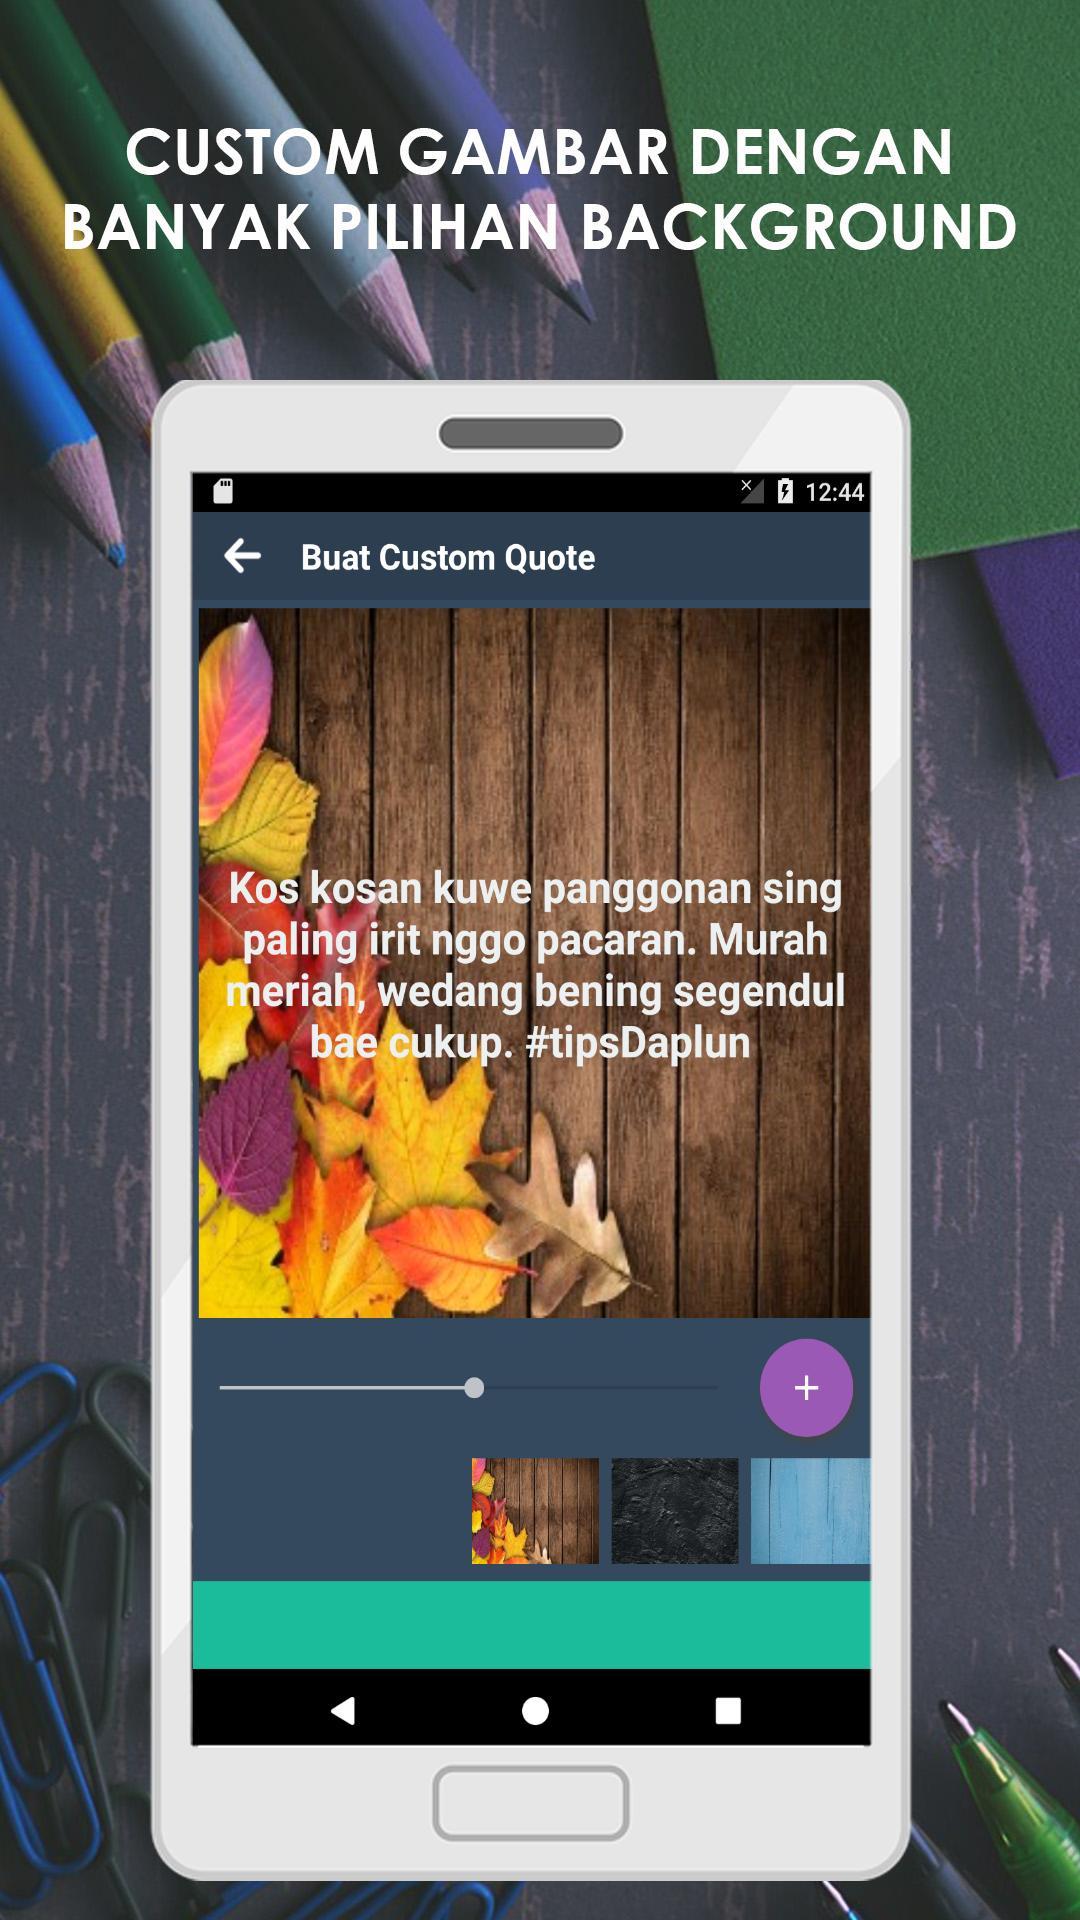 Kata Kata Lucu Bahasa Jawa Lengkap For Android APK Download